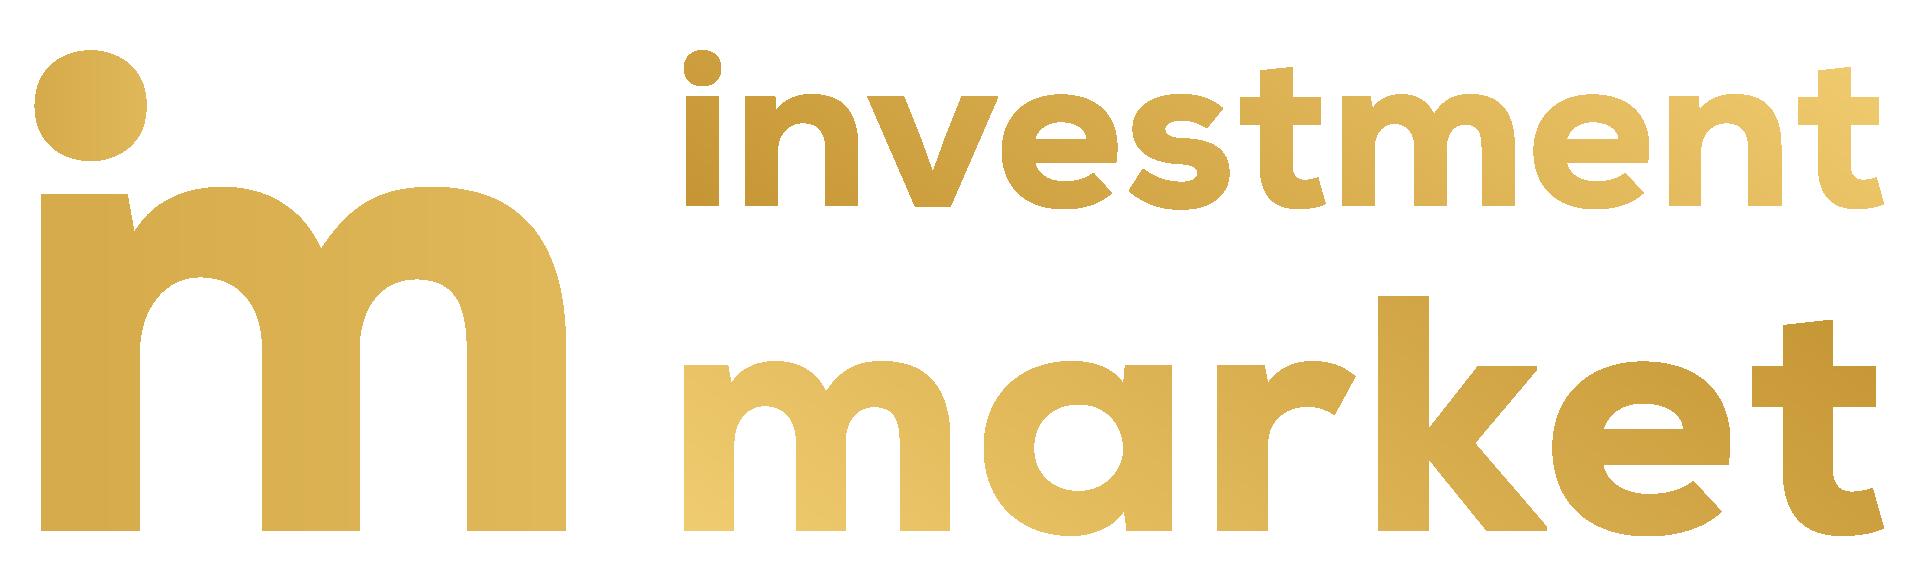 InvestmentMarket